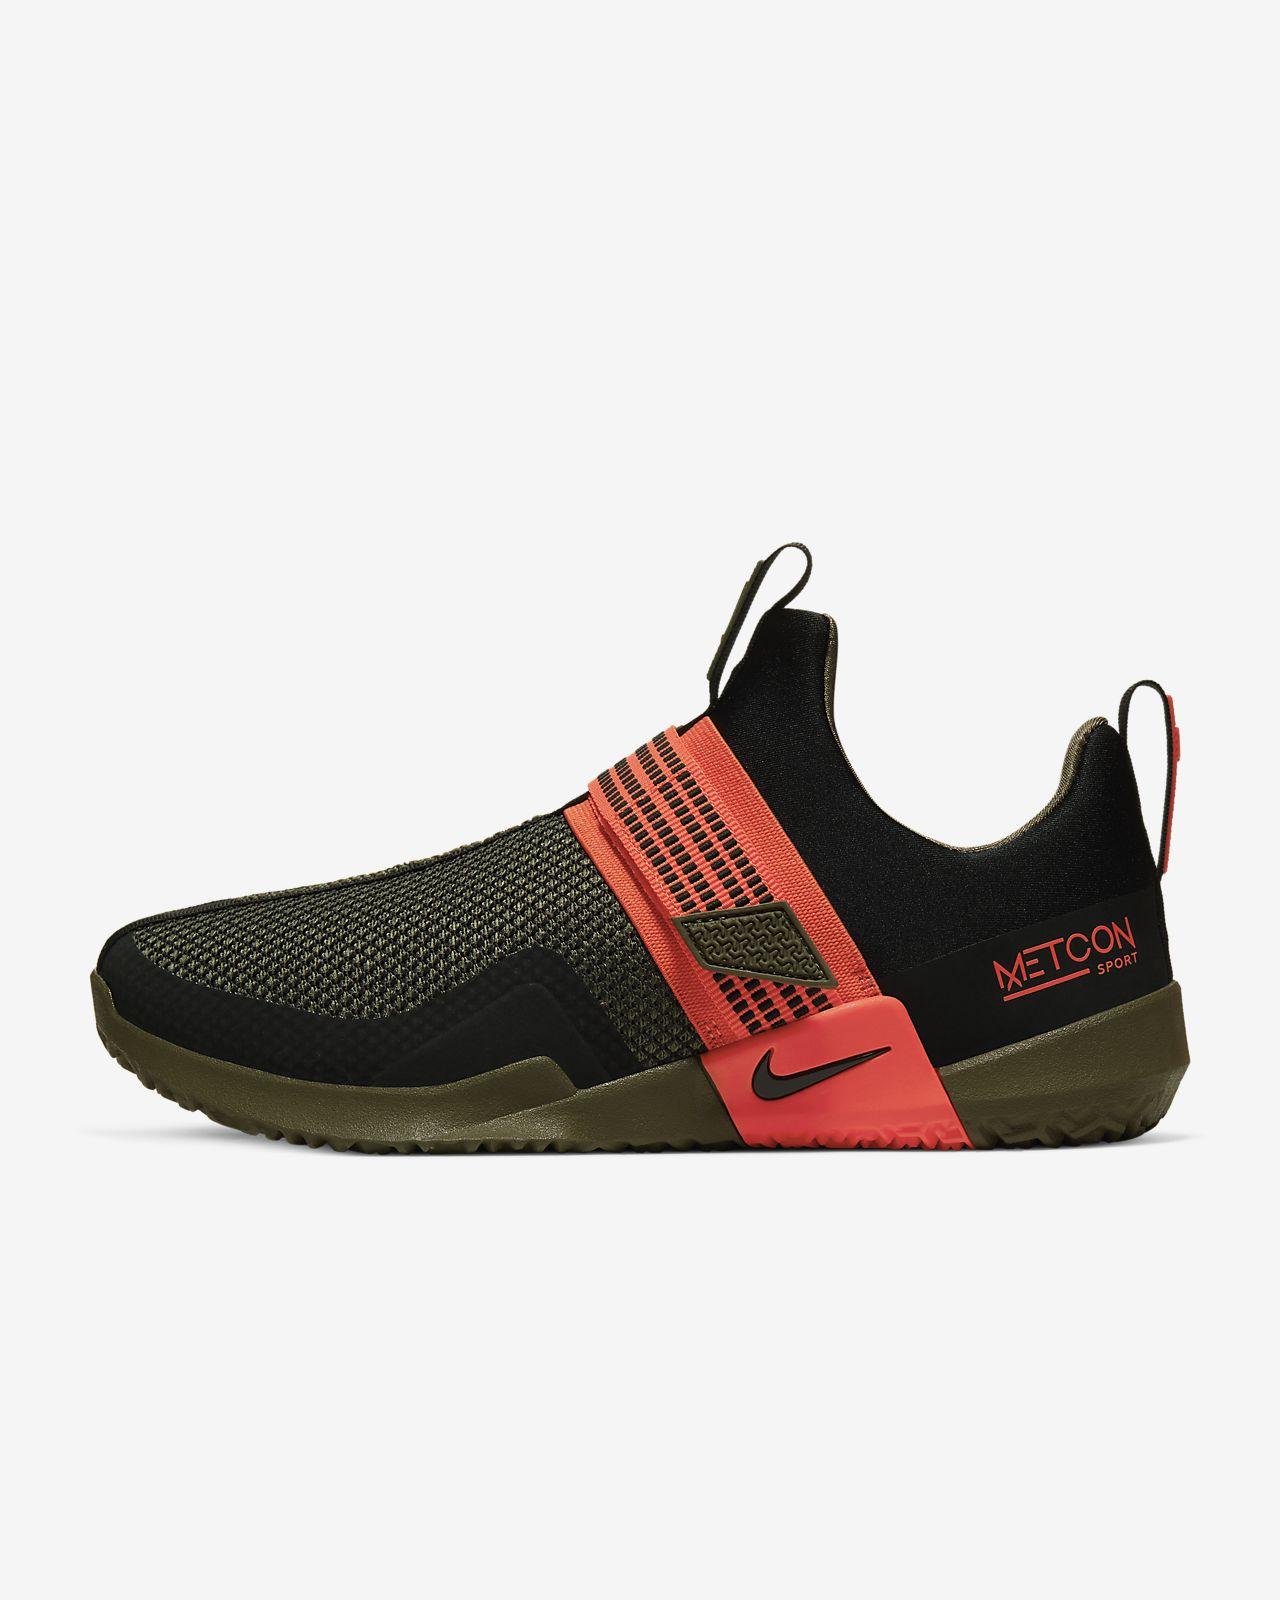 Nike Metcon Sport 男款訓練鞋